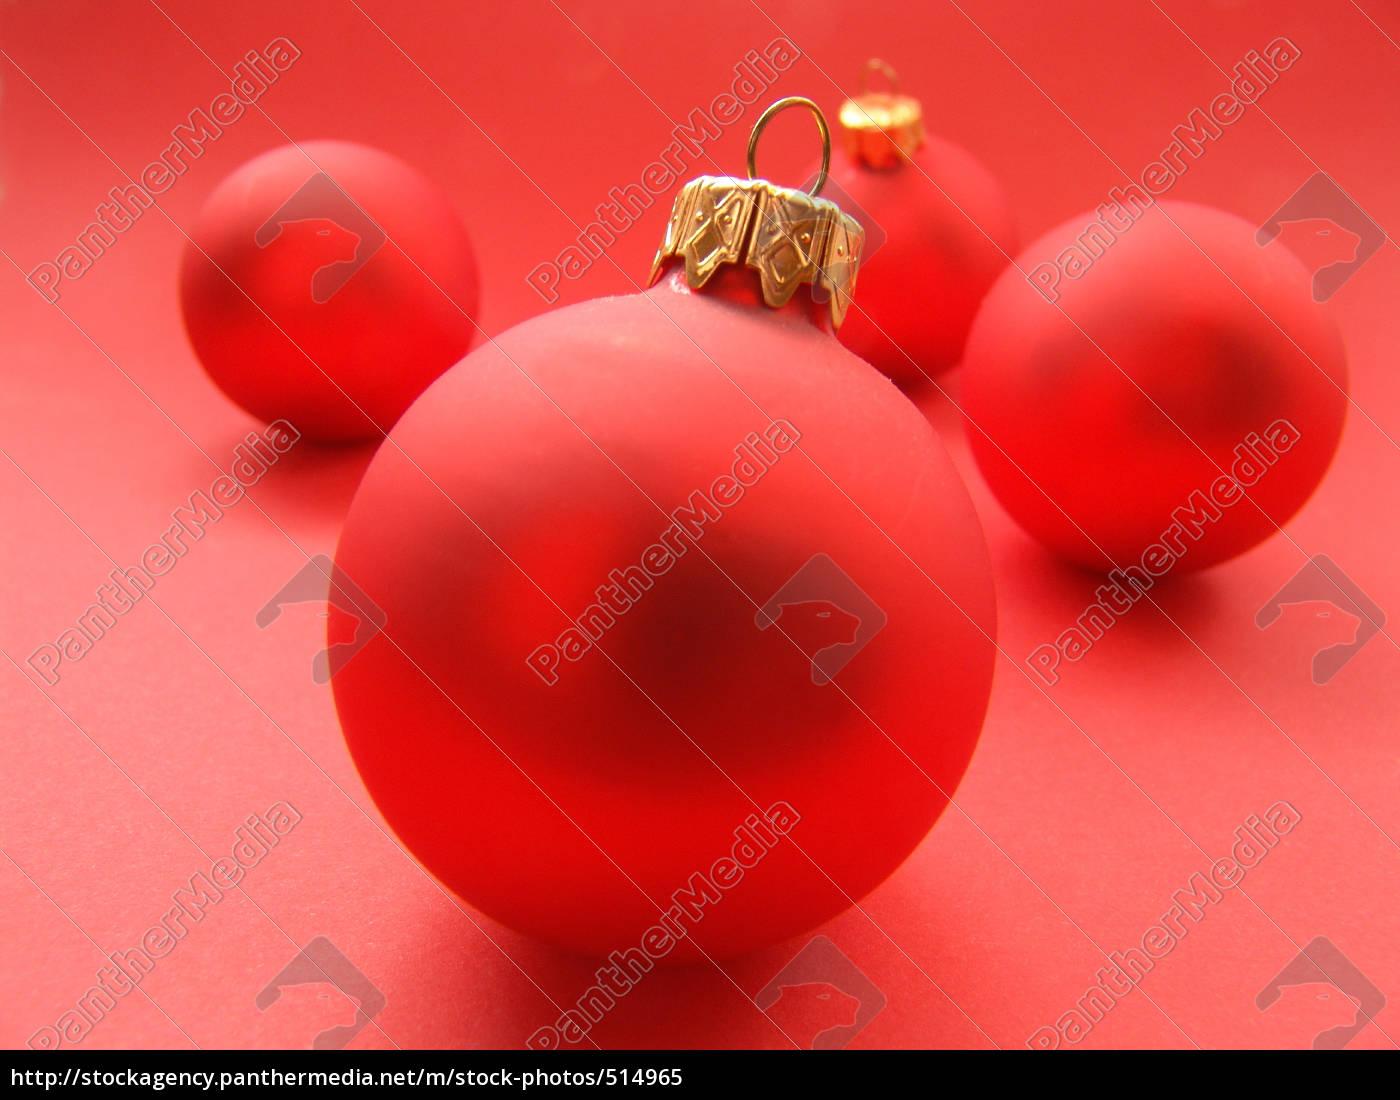 Rote Christbaumkugeln.Stockfoto 514965 Rote Christbaumkugeln